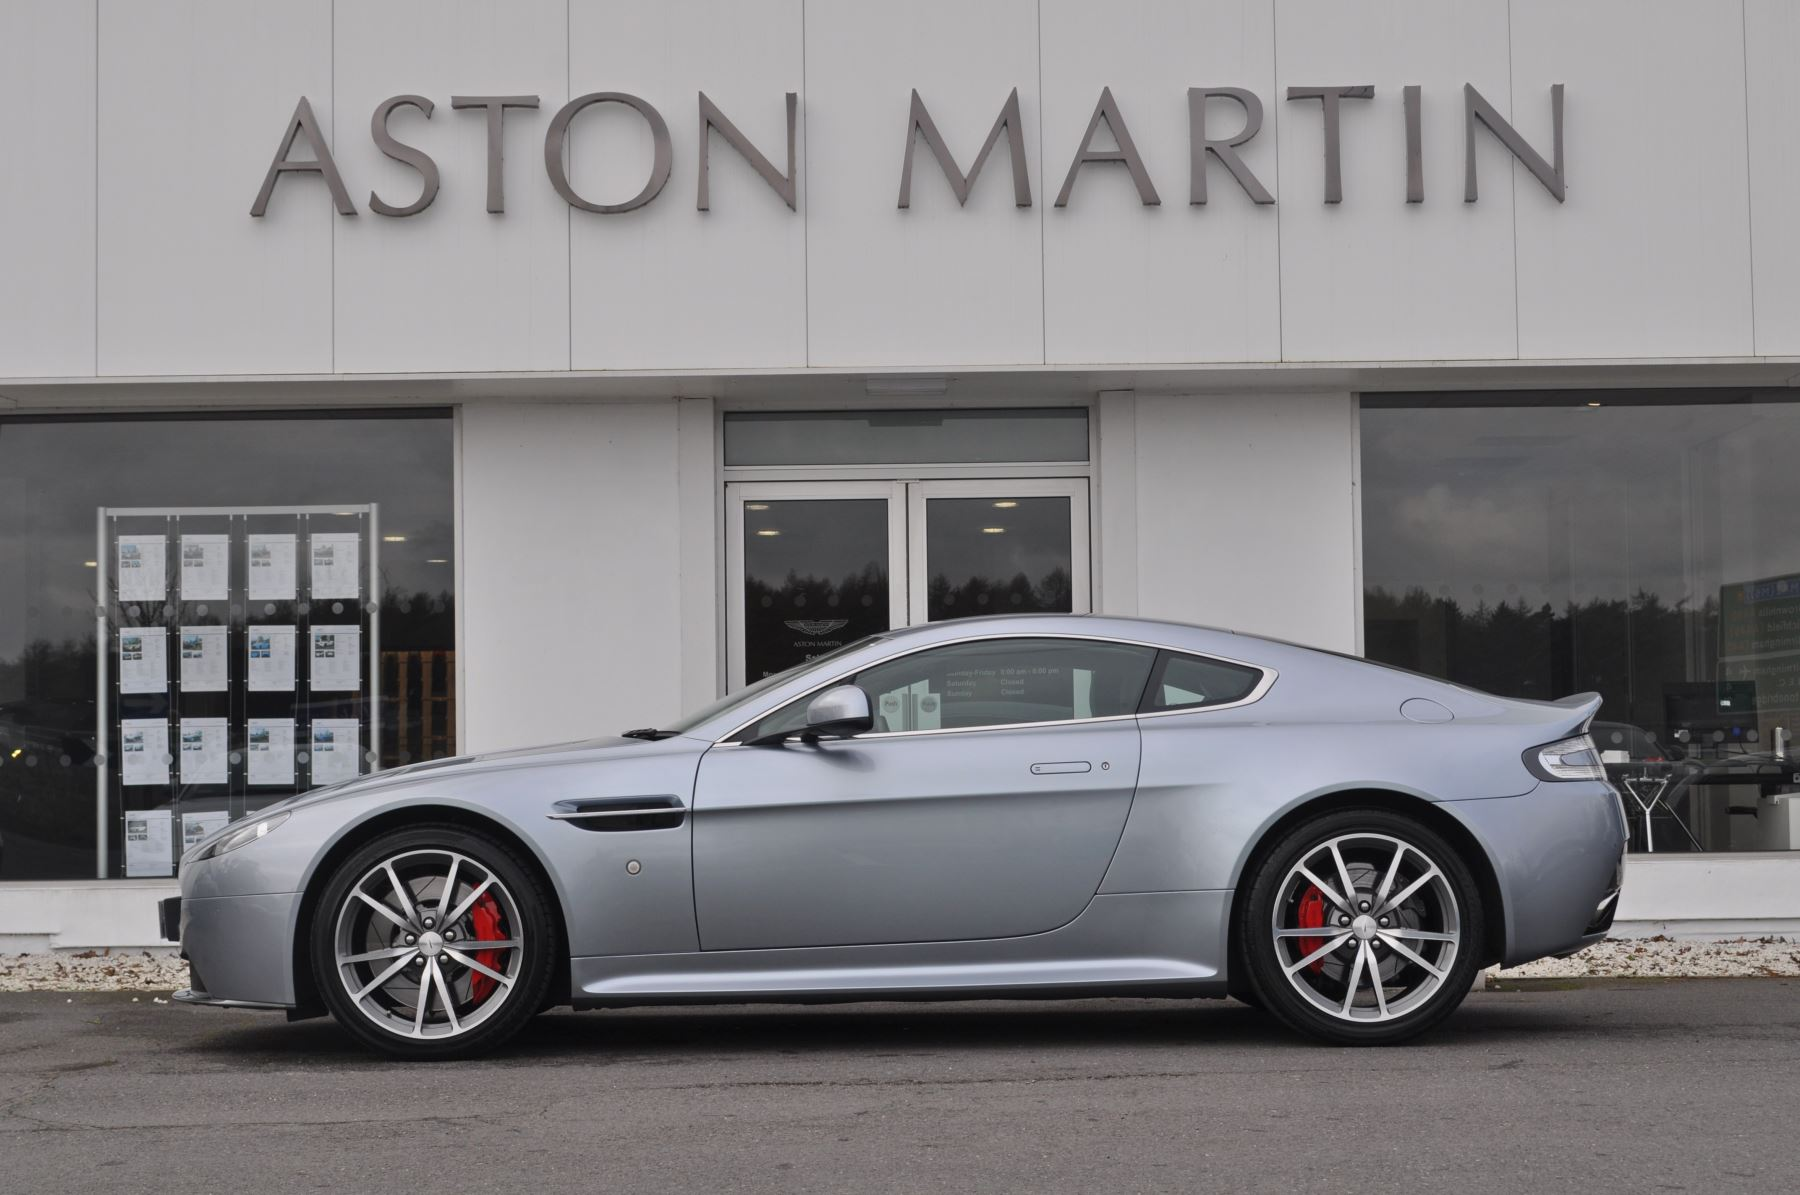 Aston Martin V8 Vantage S Coupe Coupe image 8